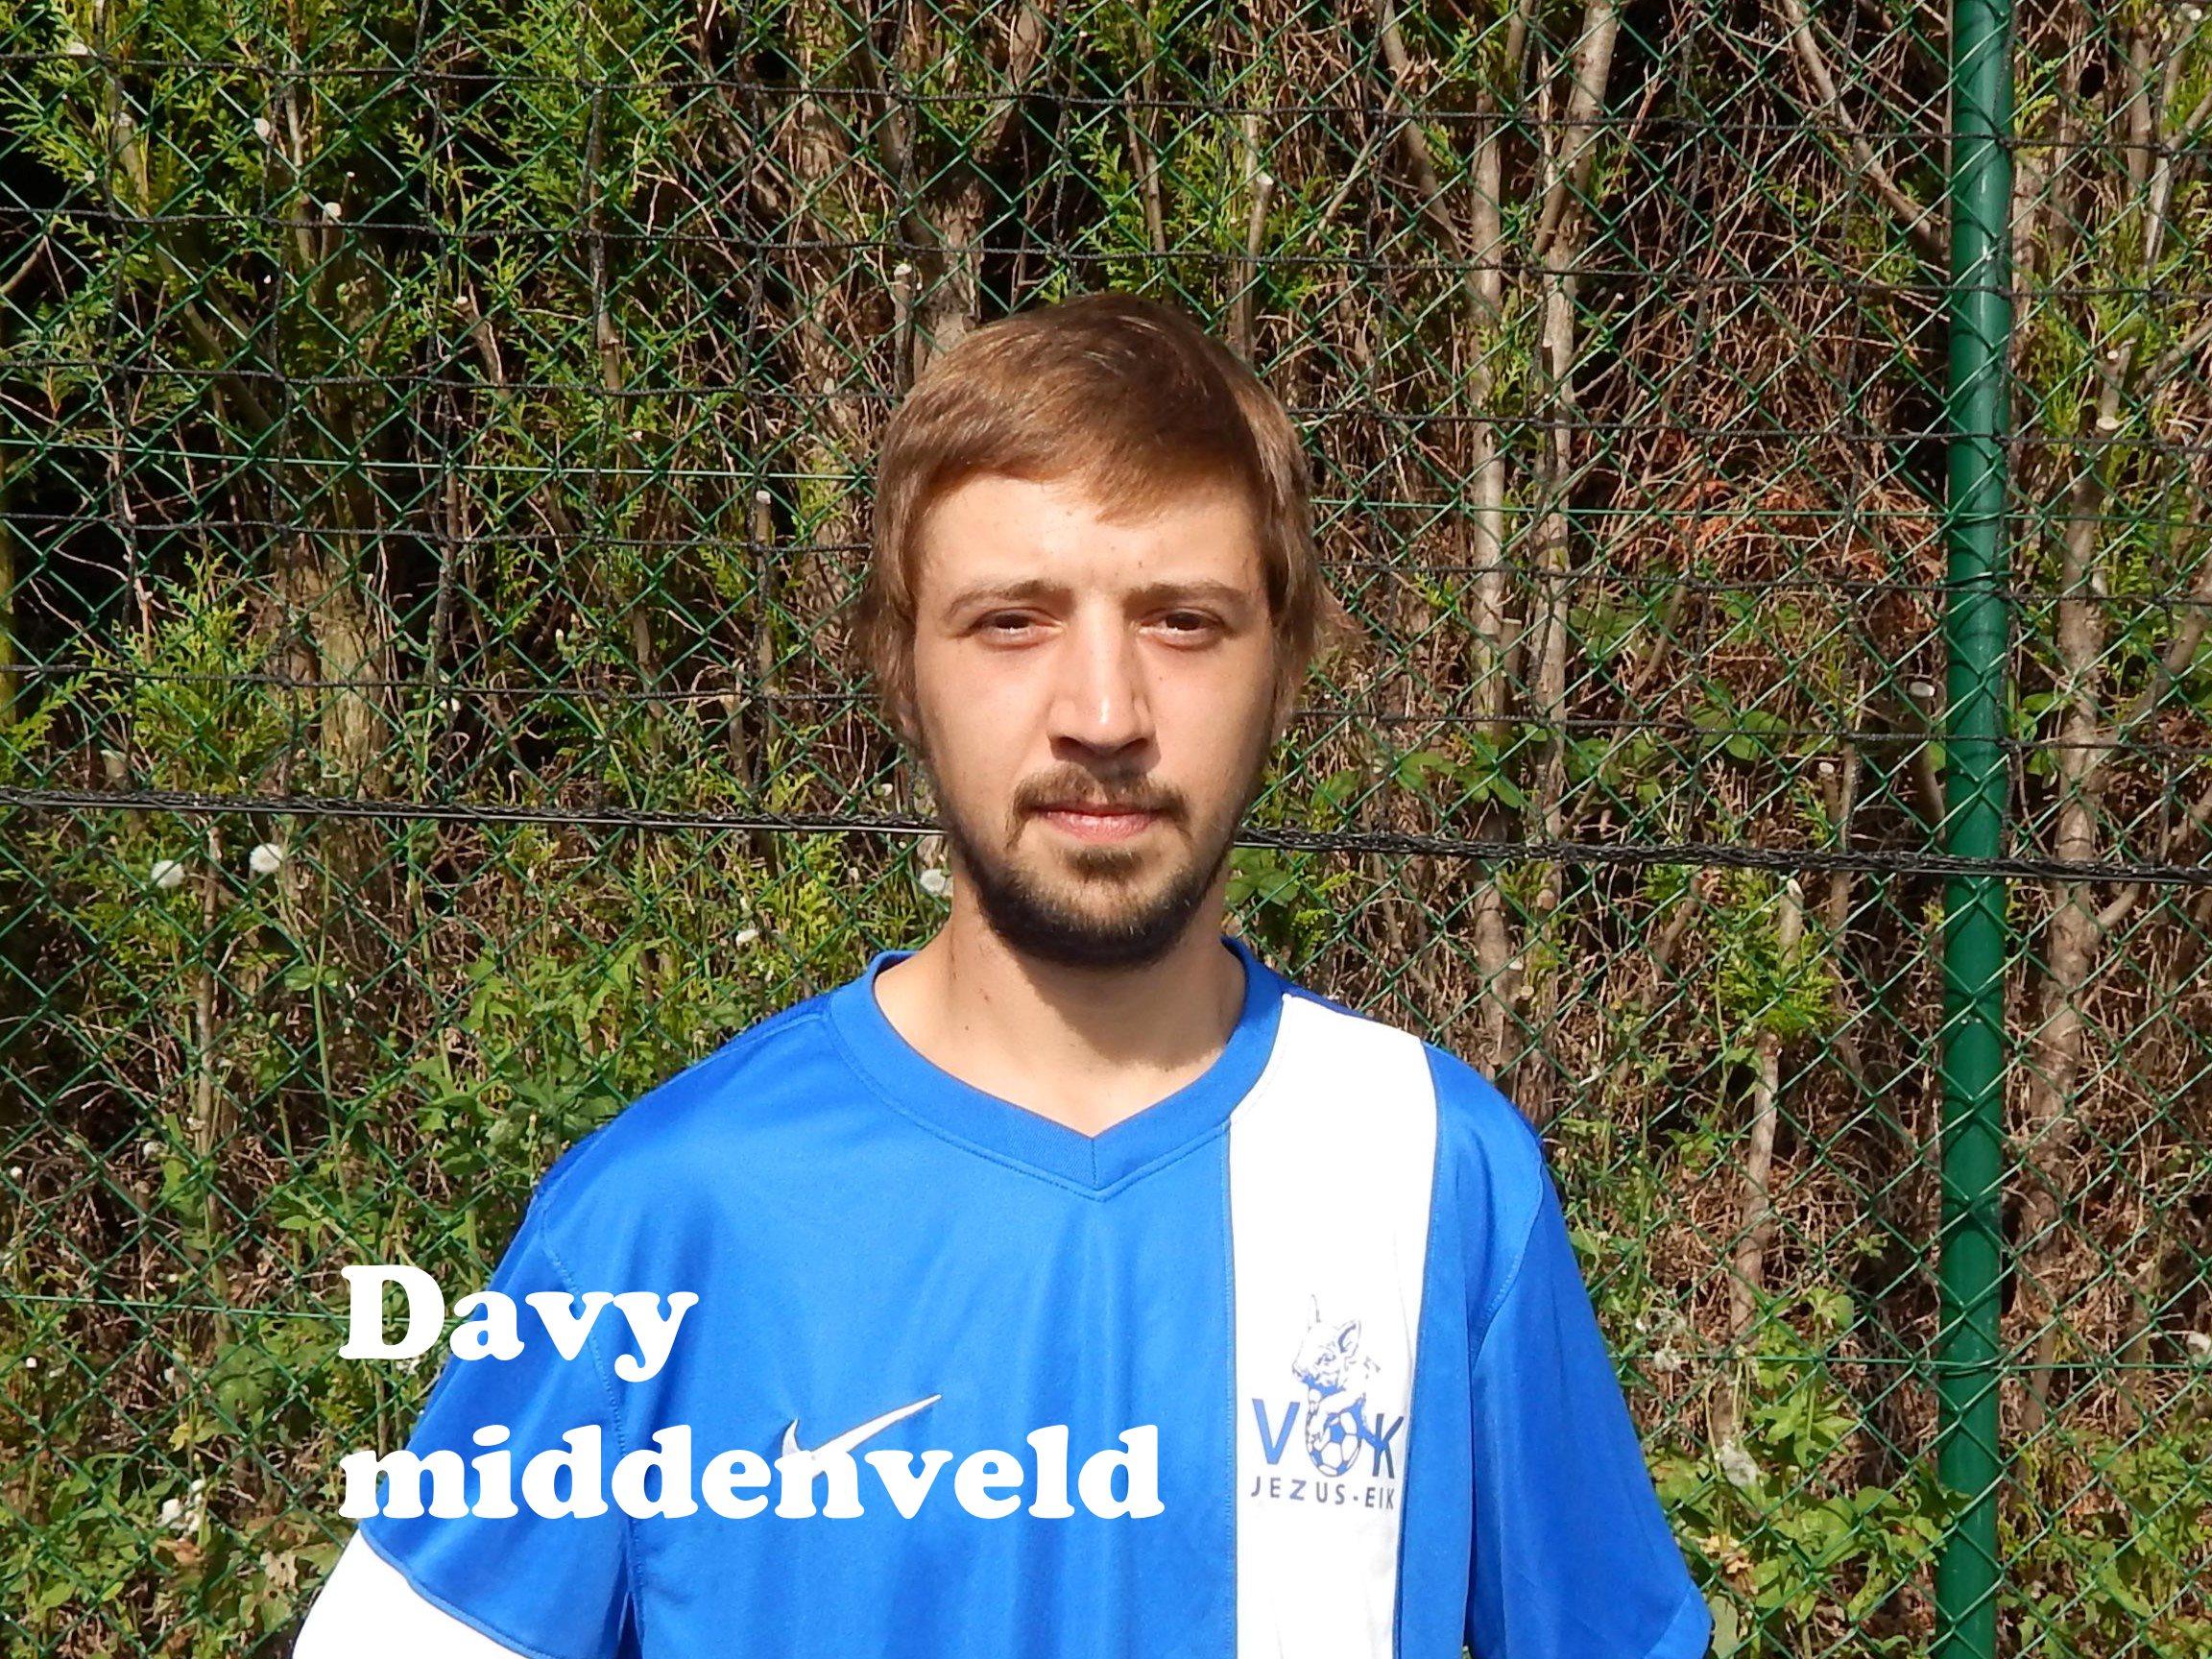 Davy - Middenvelder -